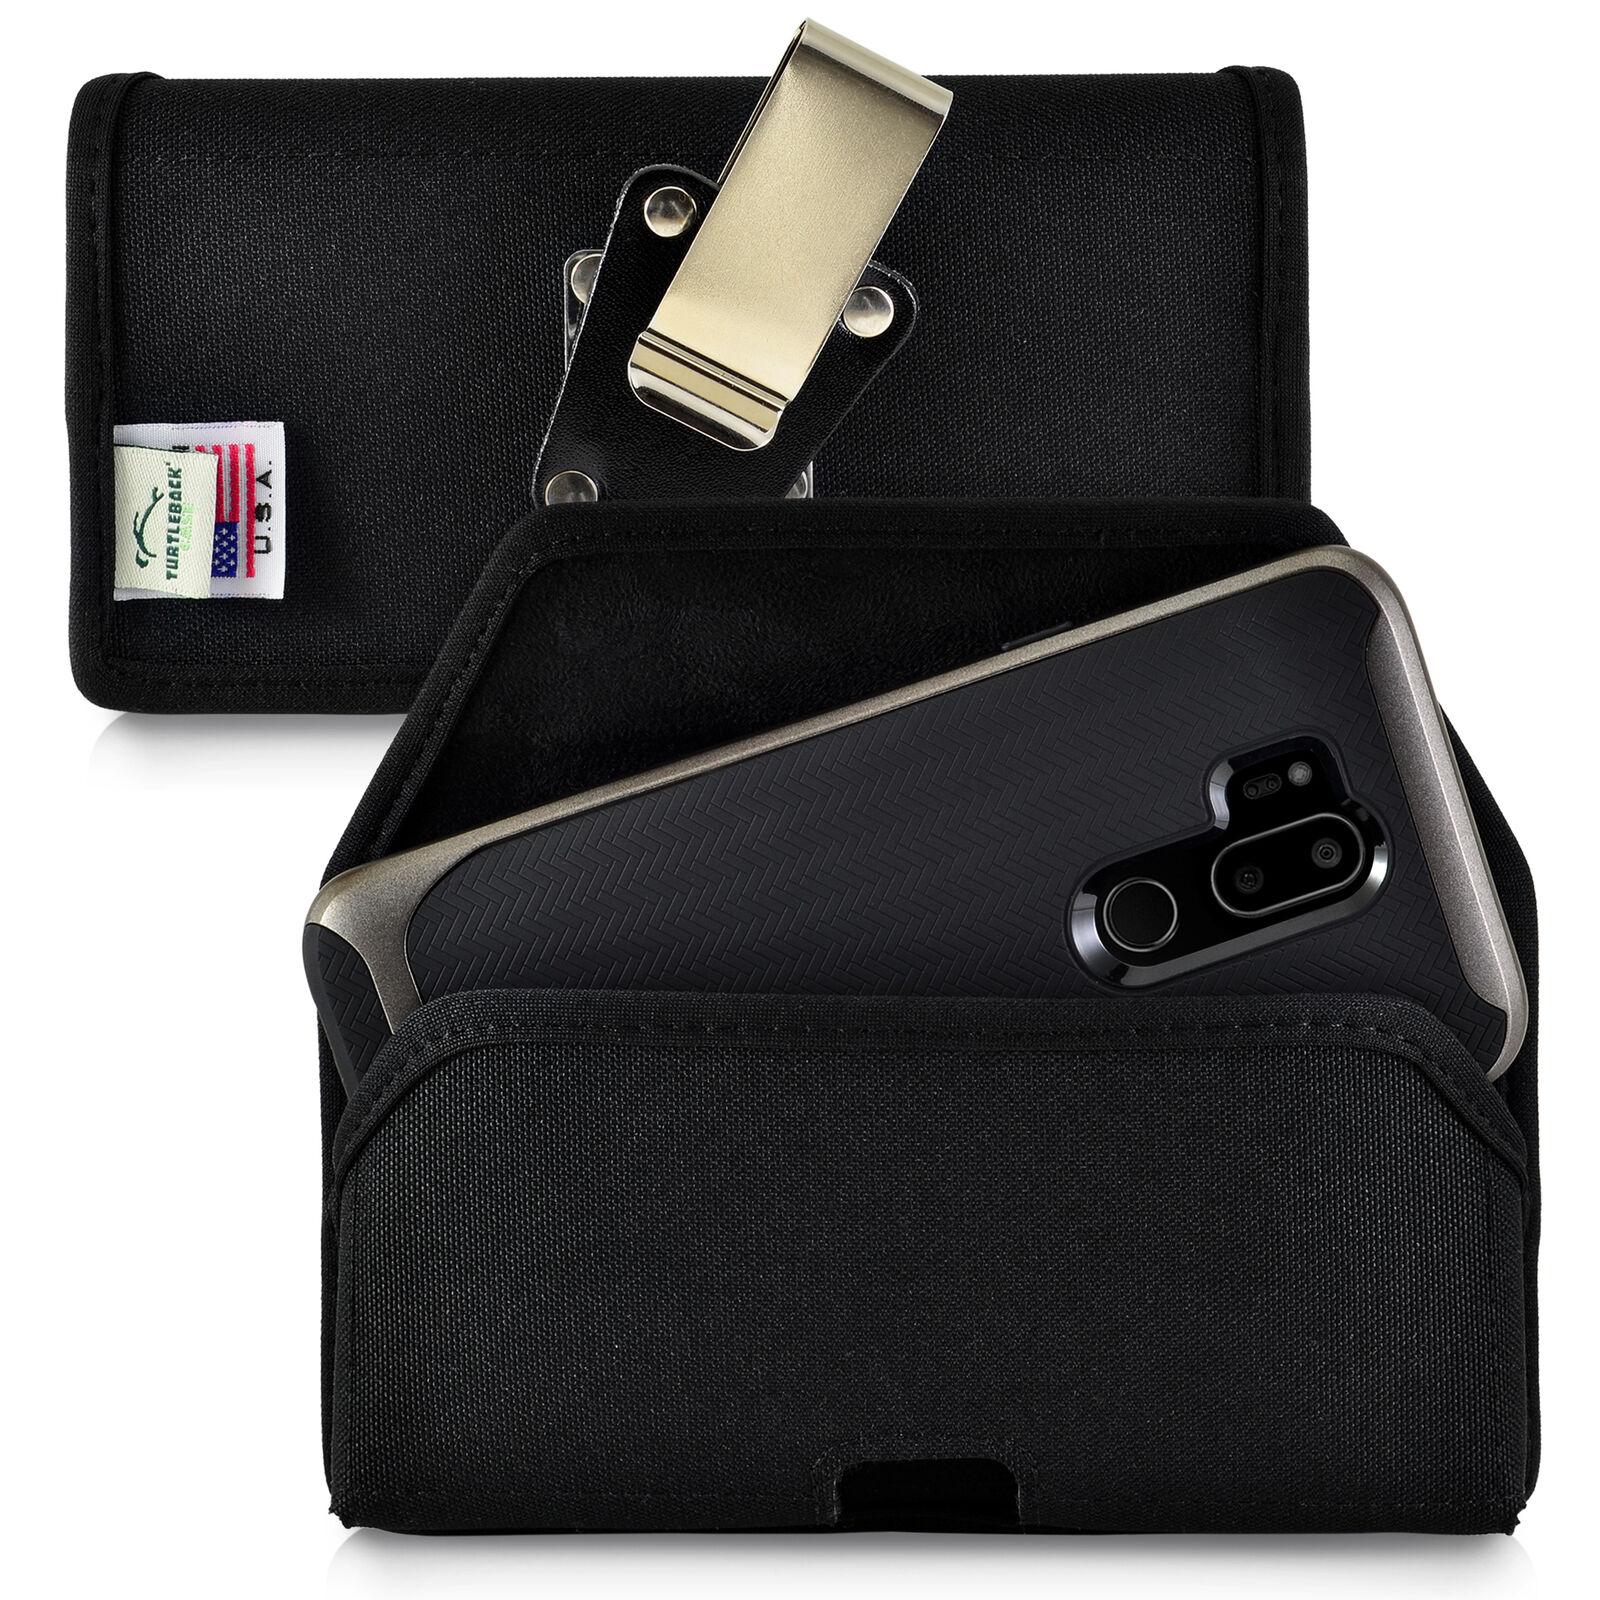 lg-g7-black-belt-case-with-rotating-belt-clip-duty-black-nylon-horizontal-pouch